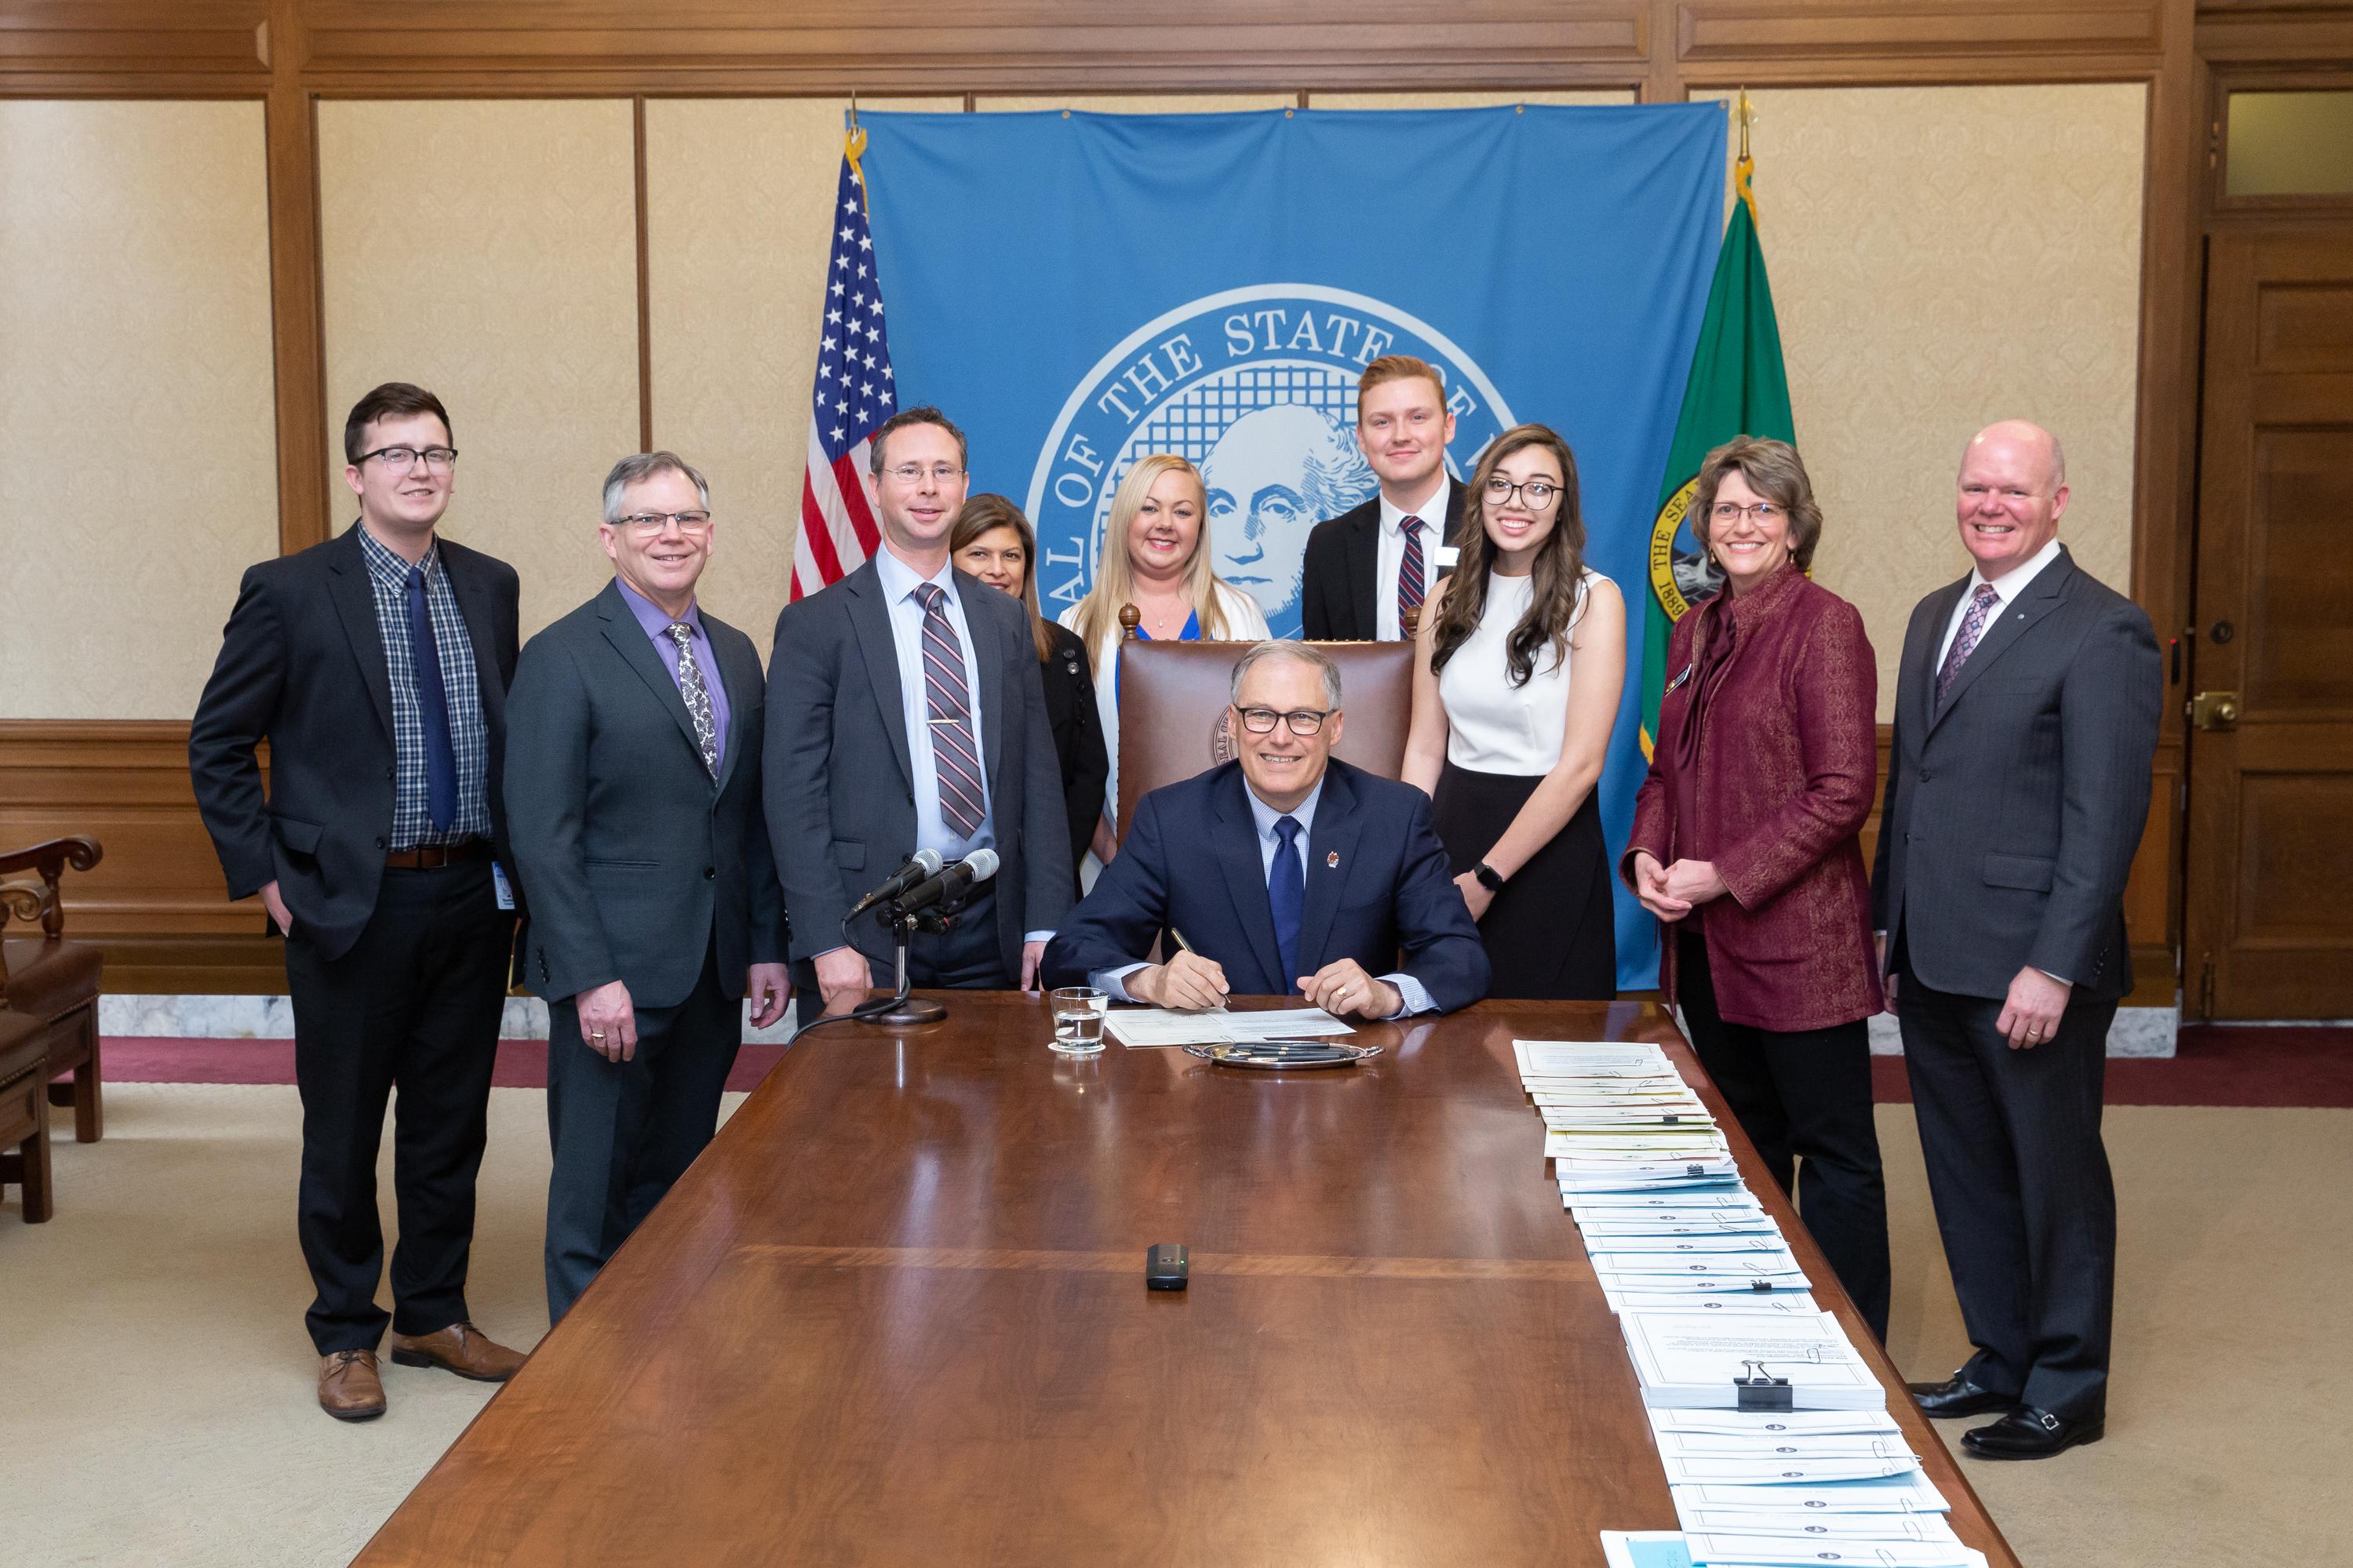 Girls Who Code works with Washington State on CS-focused legislation